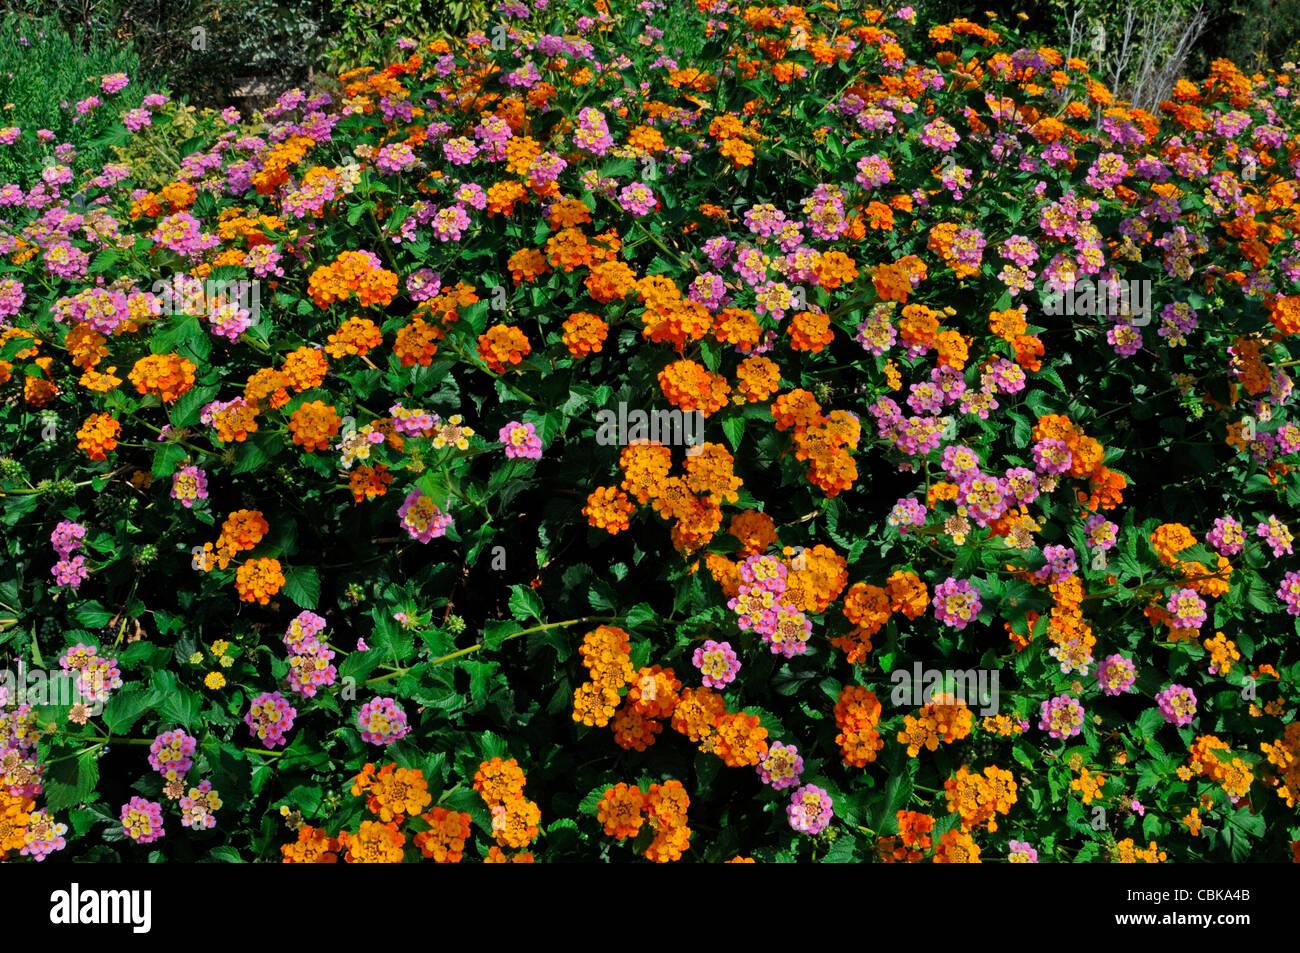 A colourful border detail of Lantana camara - Stock Image